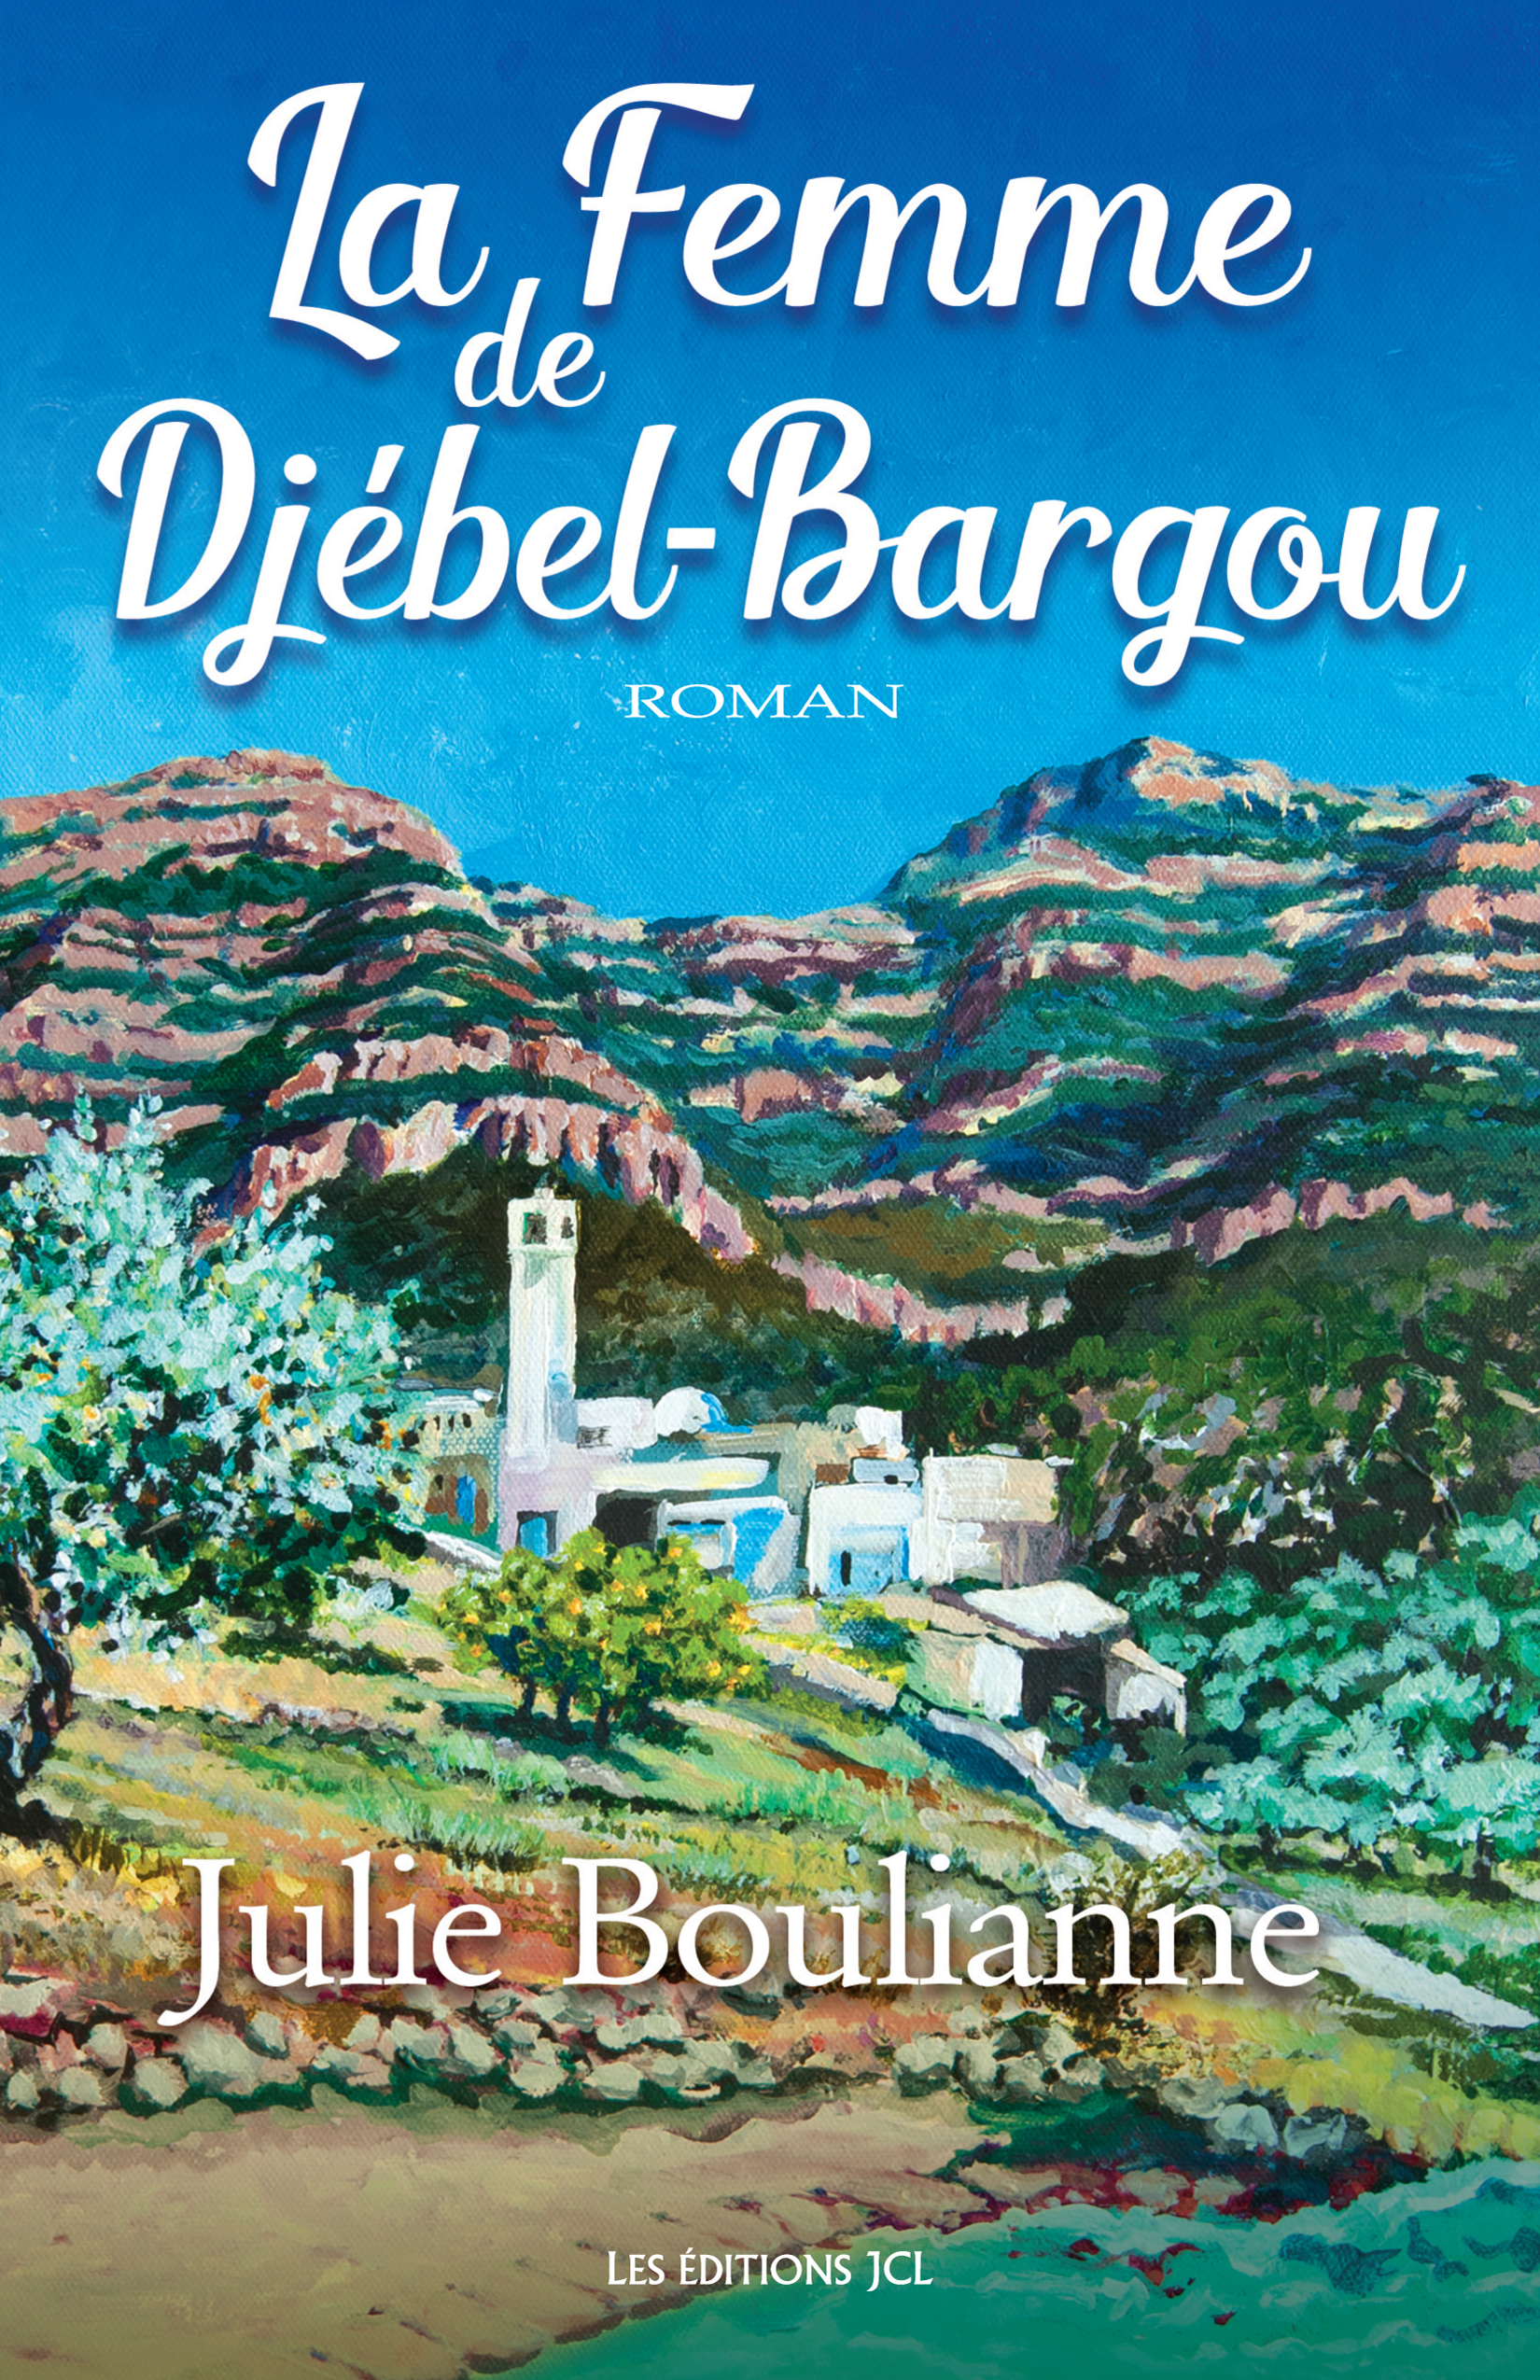 La Femme de Djébel-Bargou